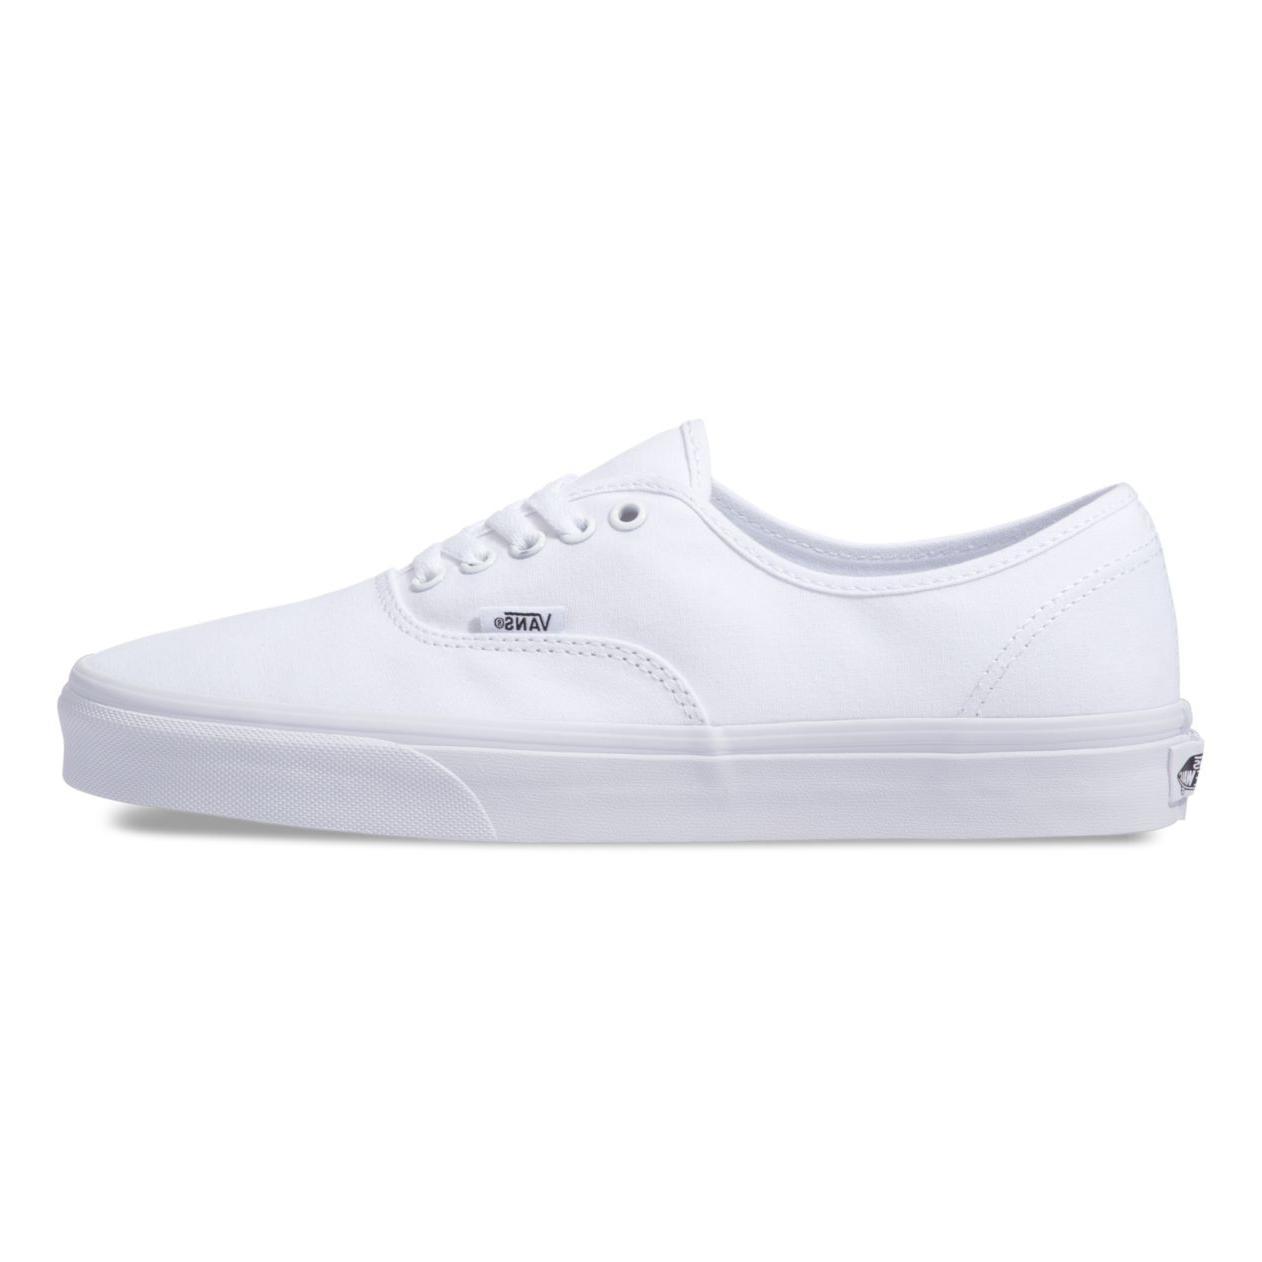 New Women Vans New Authentic White Canvas Shoes